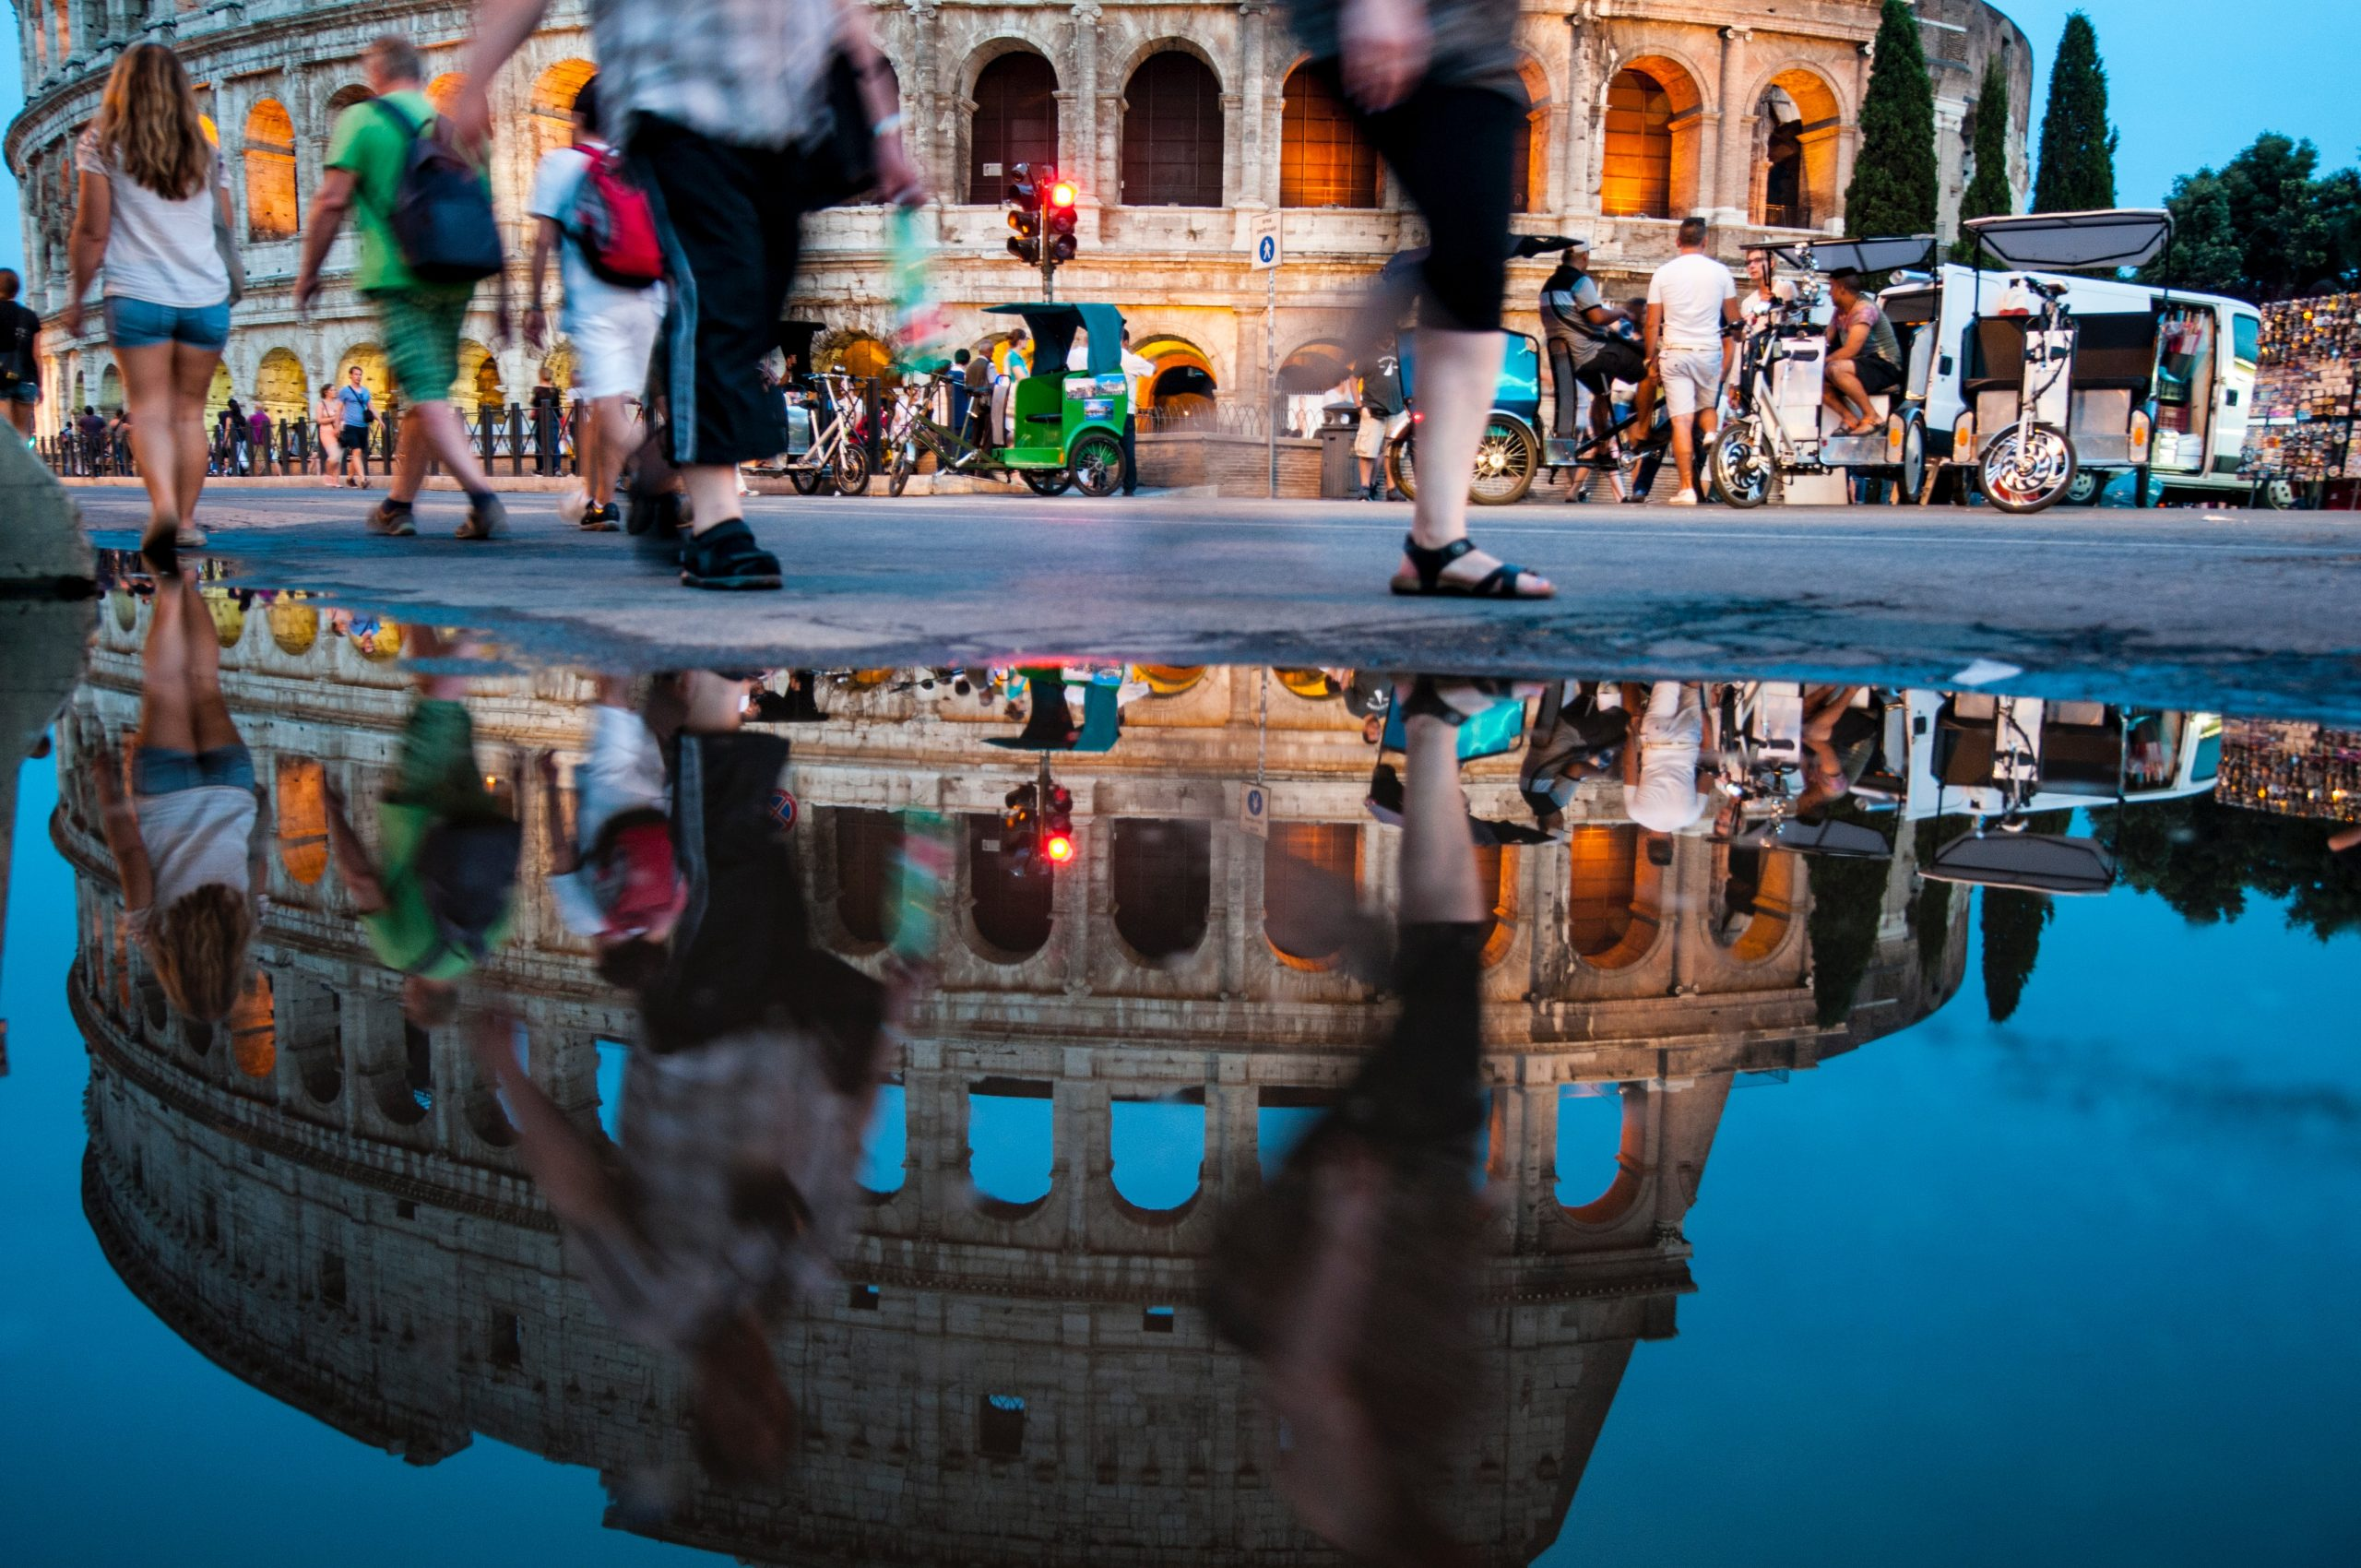 Come capire Roma (pensando all'Emilia-Romagna).